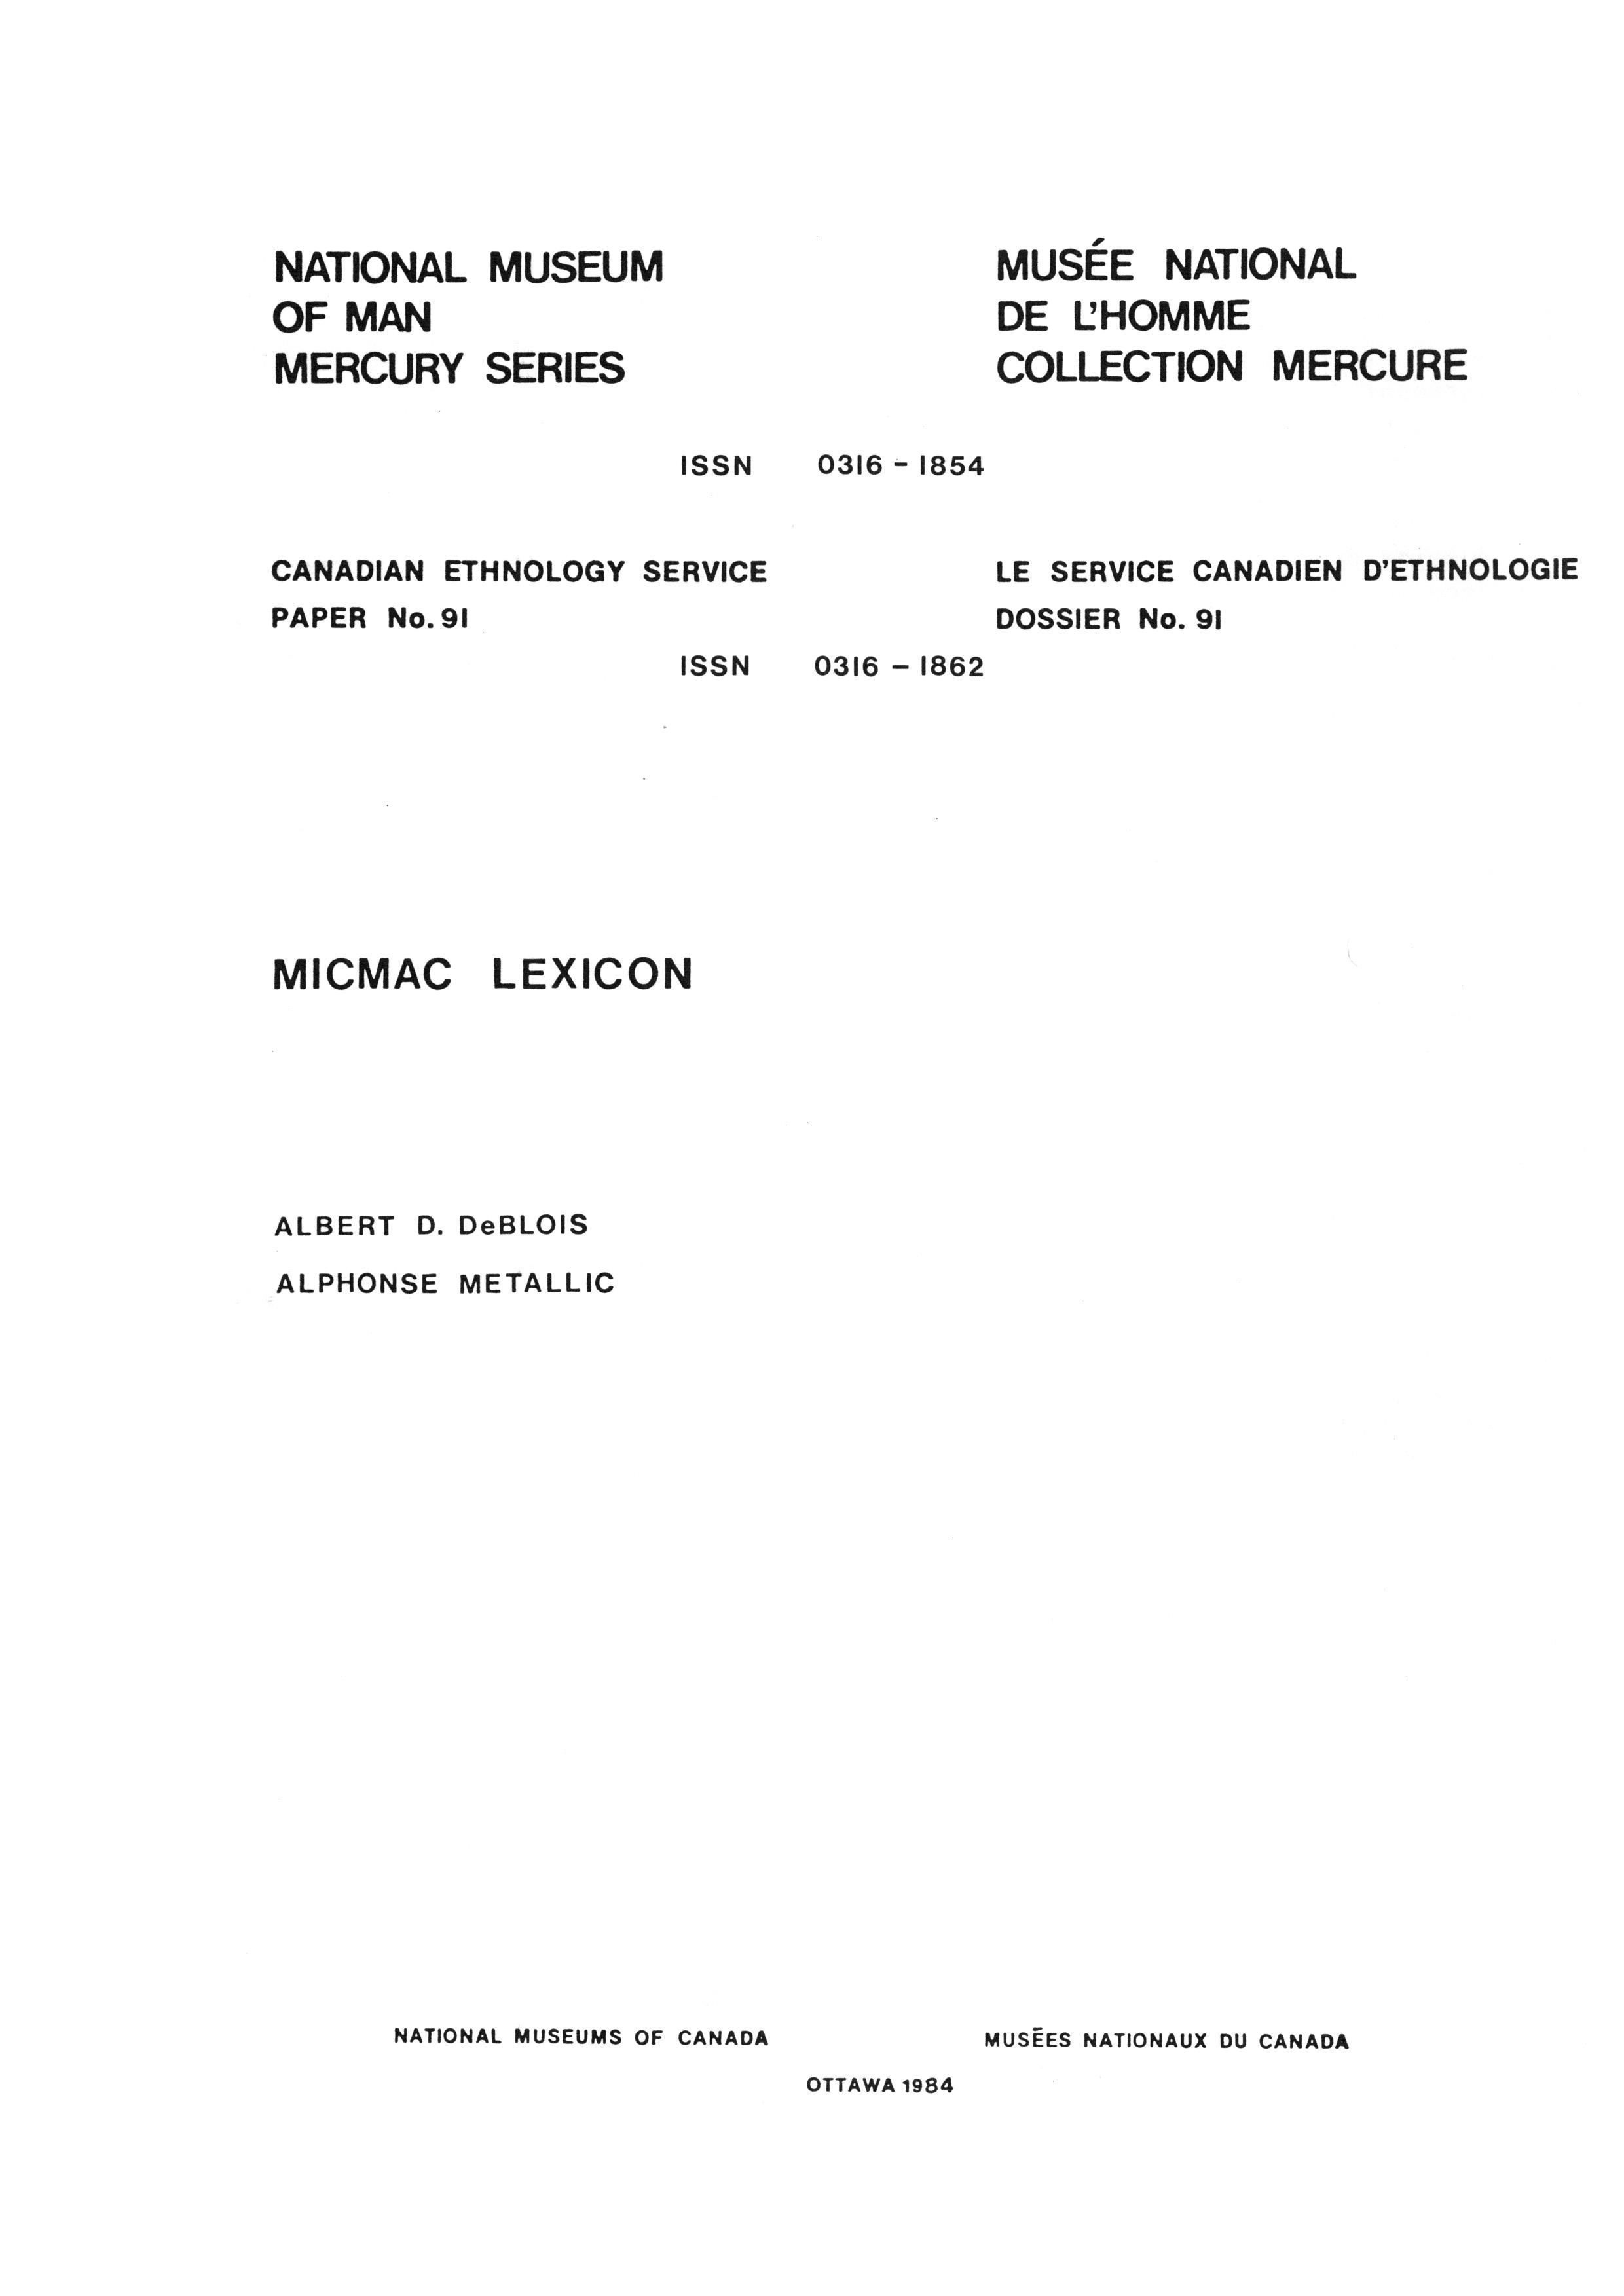 Micmac lexicon